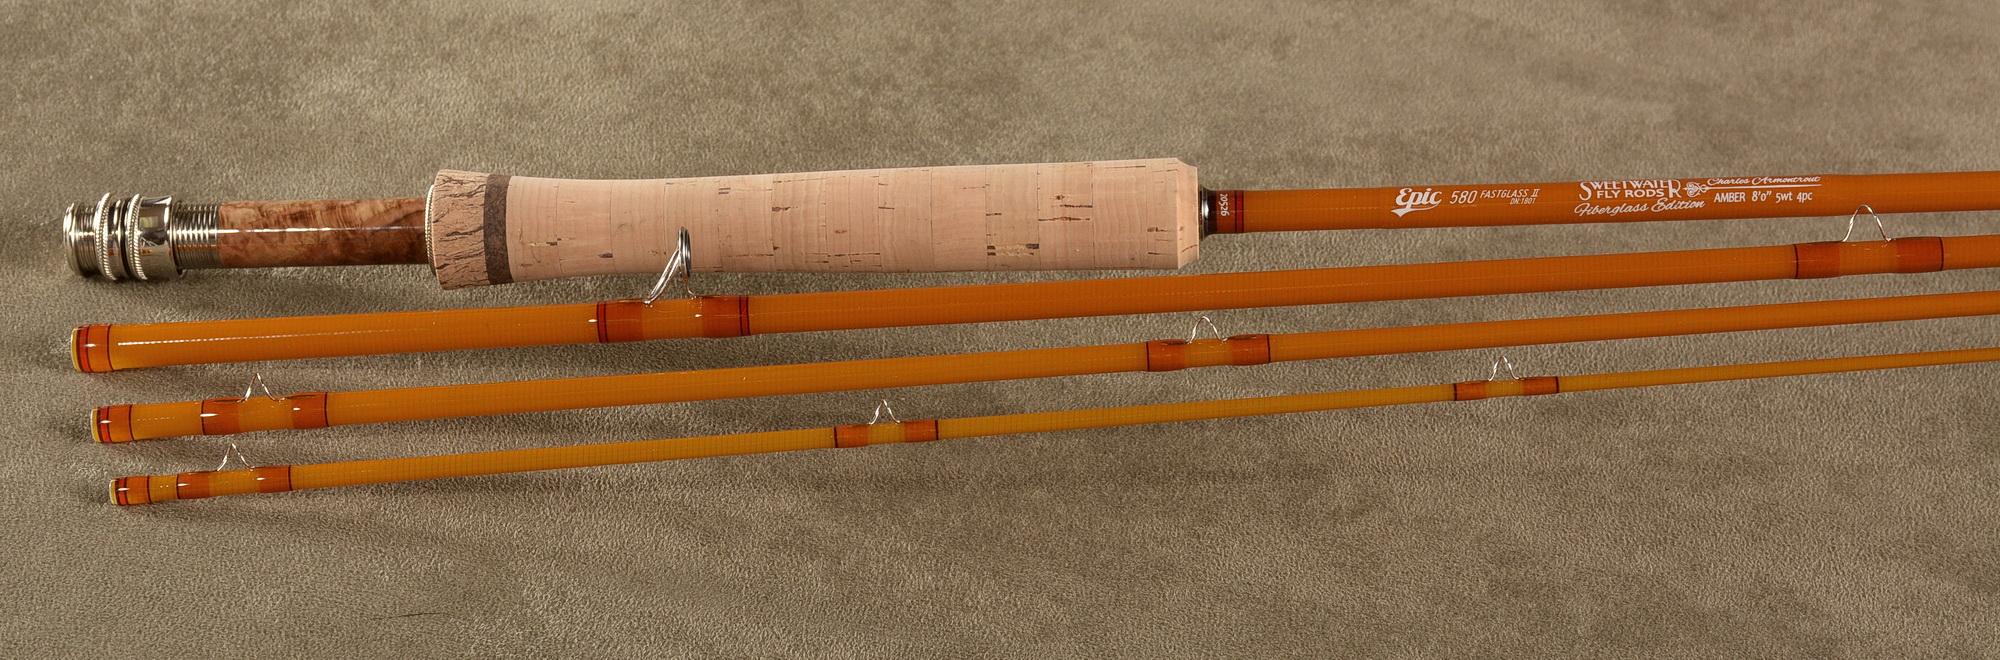 EPIC 580 Amber-20526-4